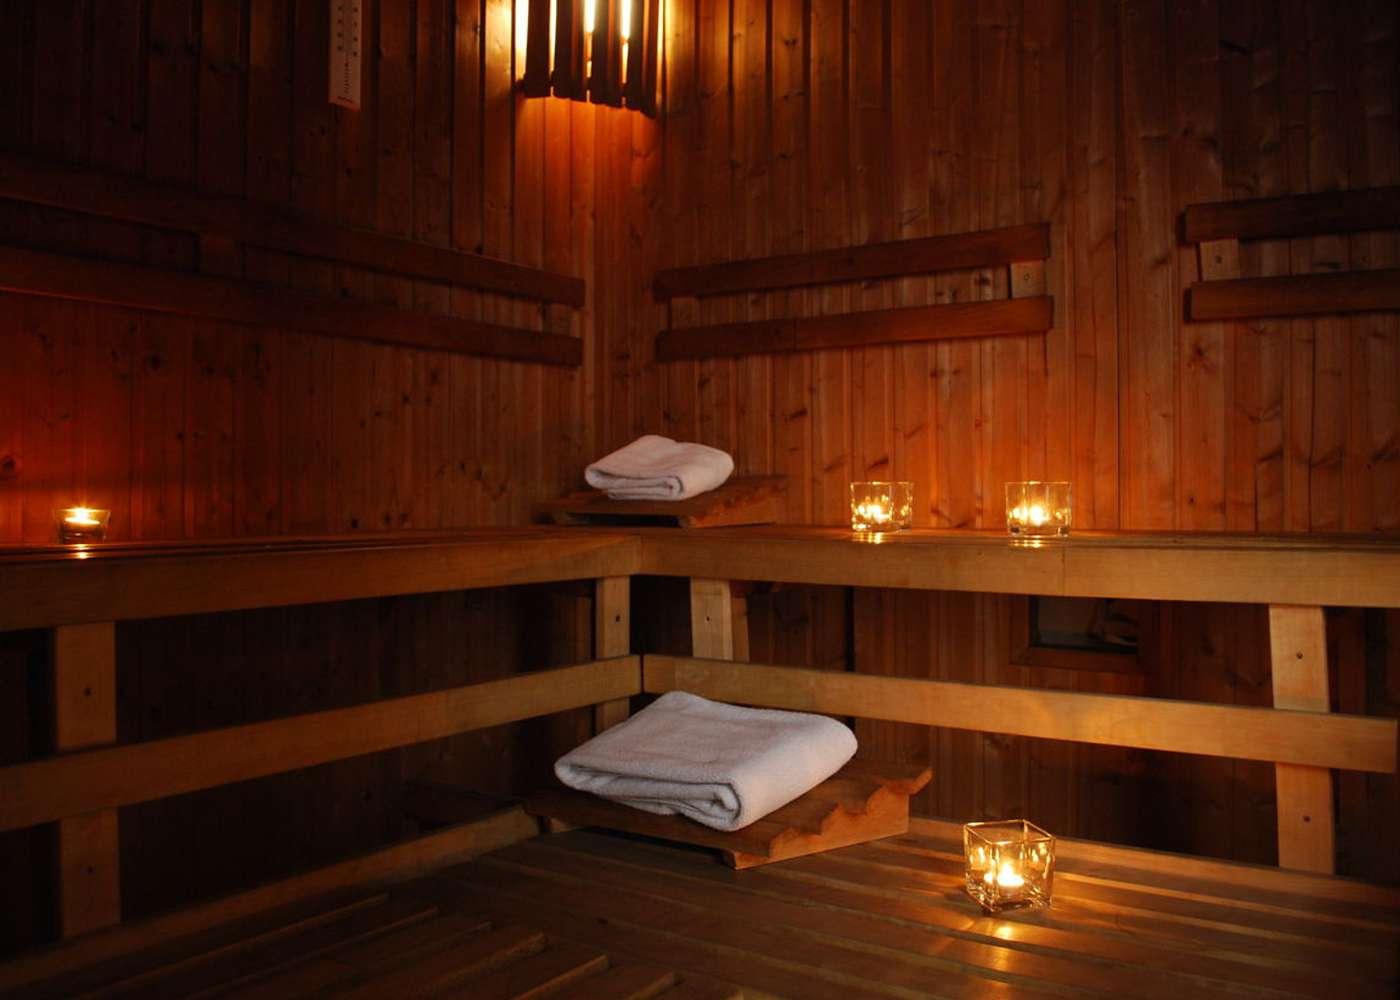 galeria Sauna zdjęcie 2